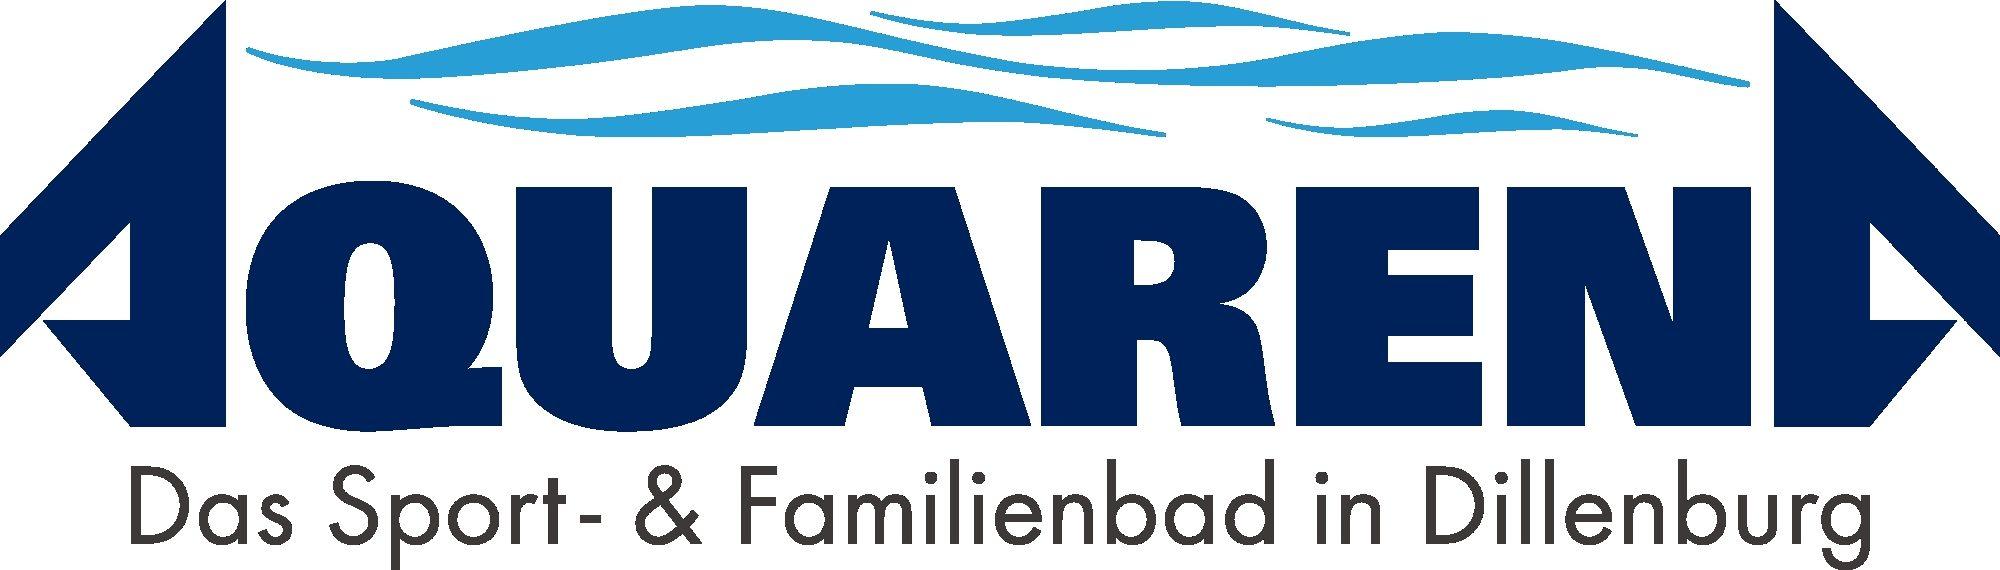 Logo des Aquarena - Das Sport und Familienbad in Dillenburg